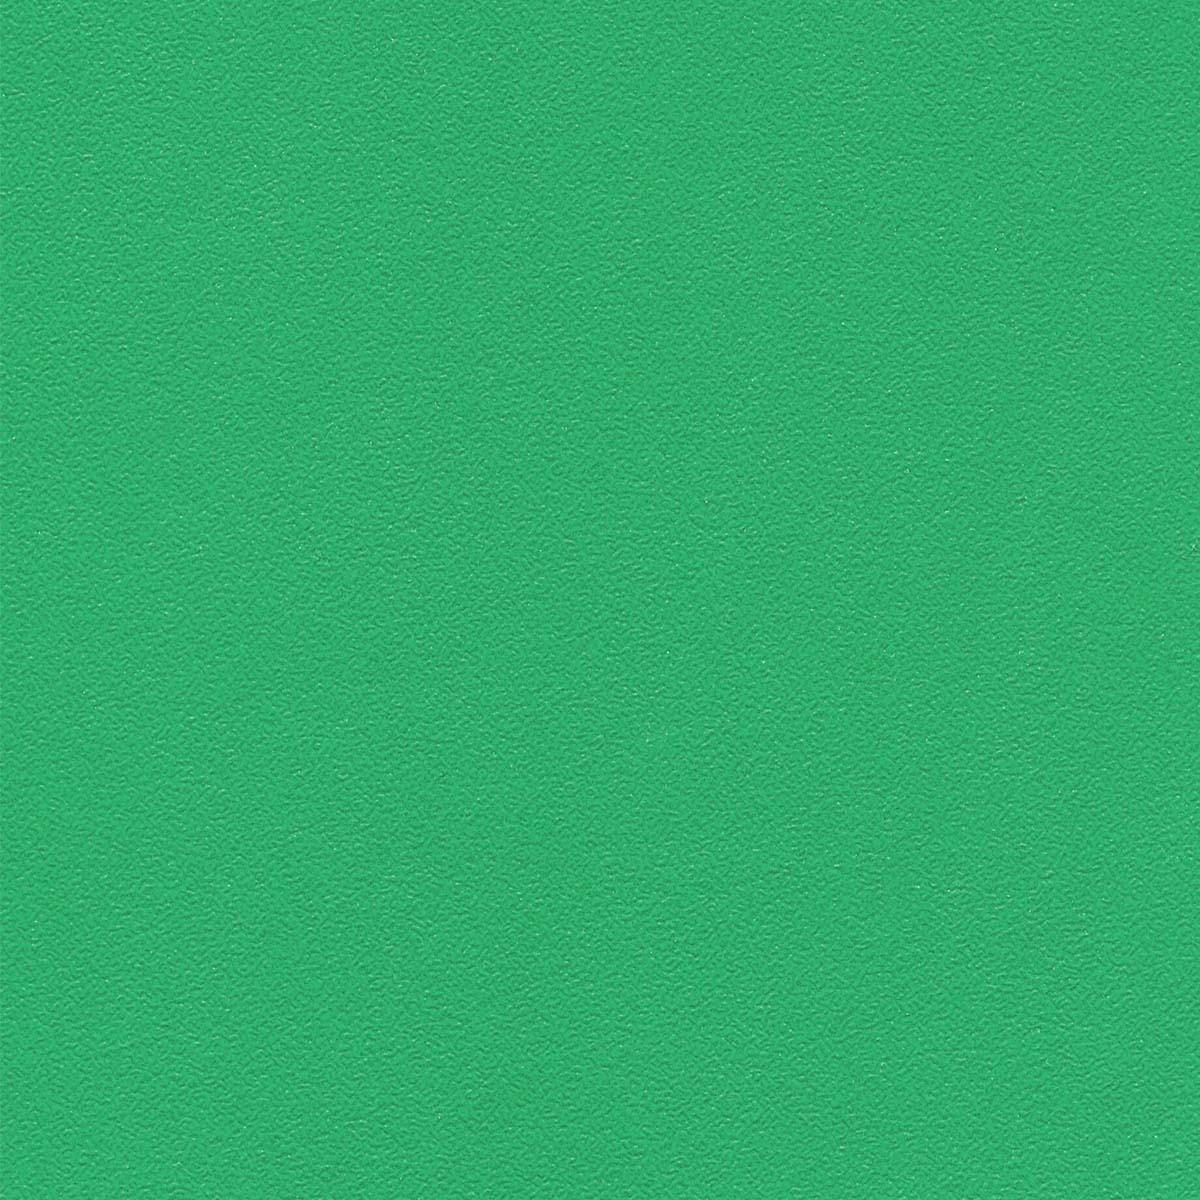 HF1956 PE Emerald